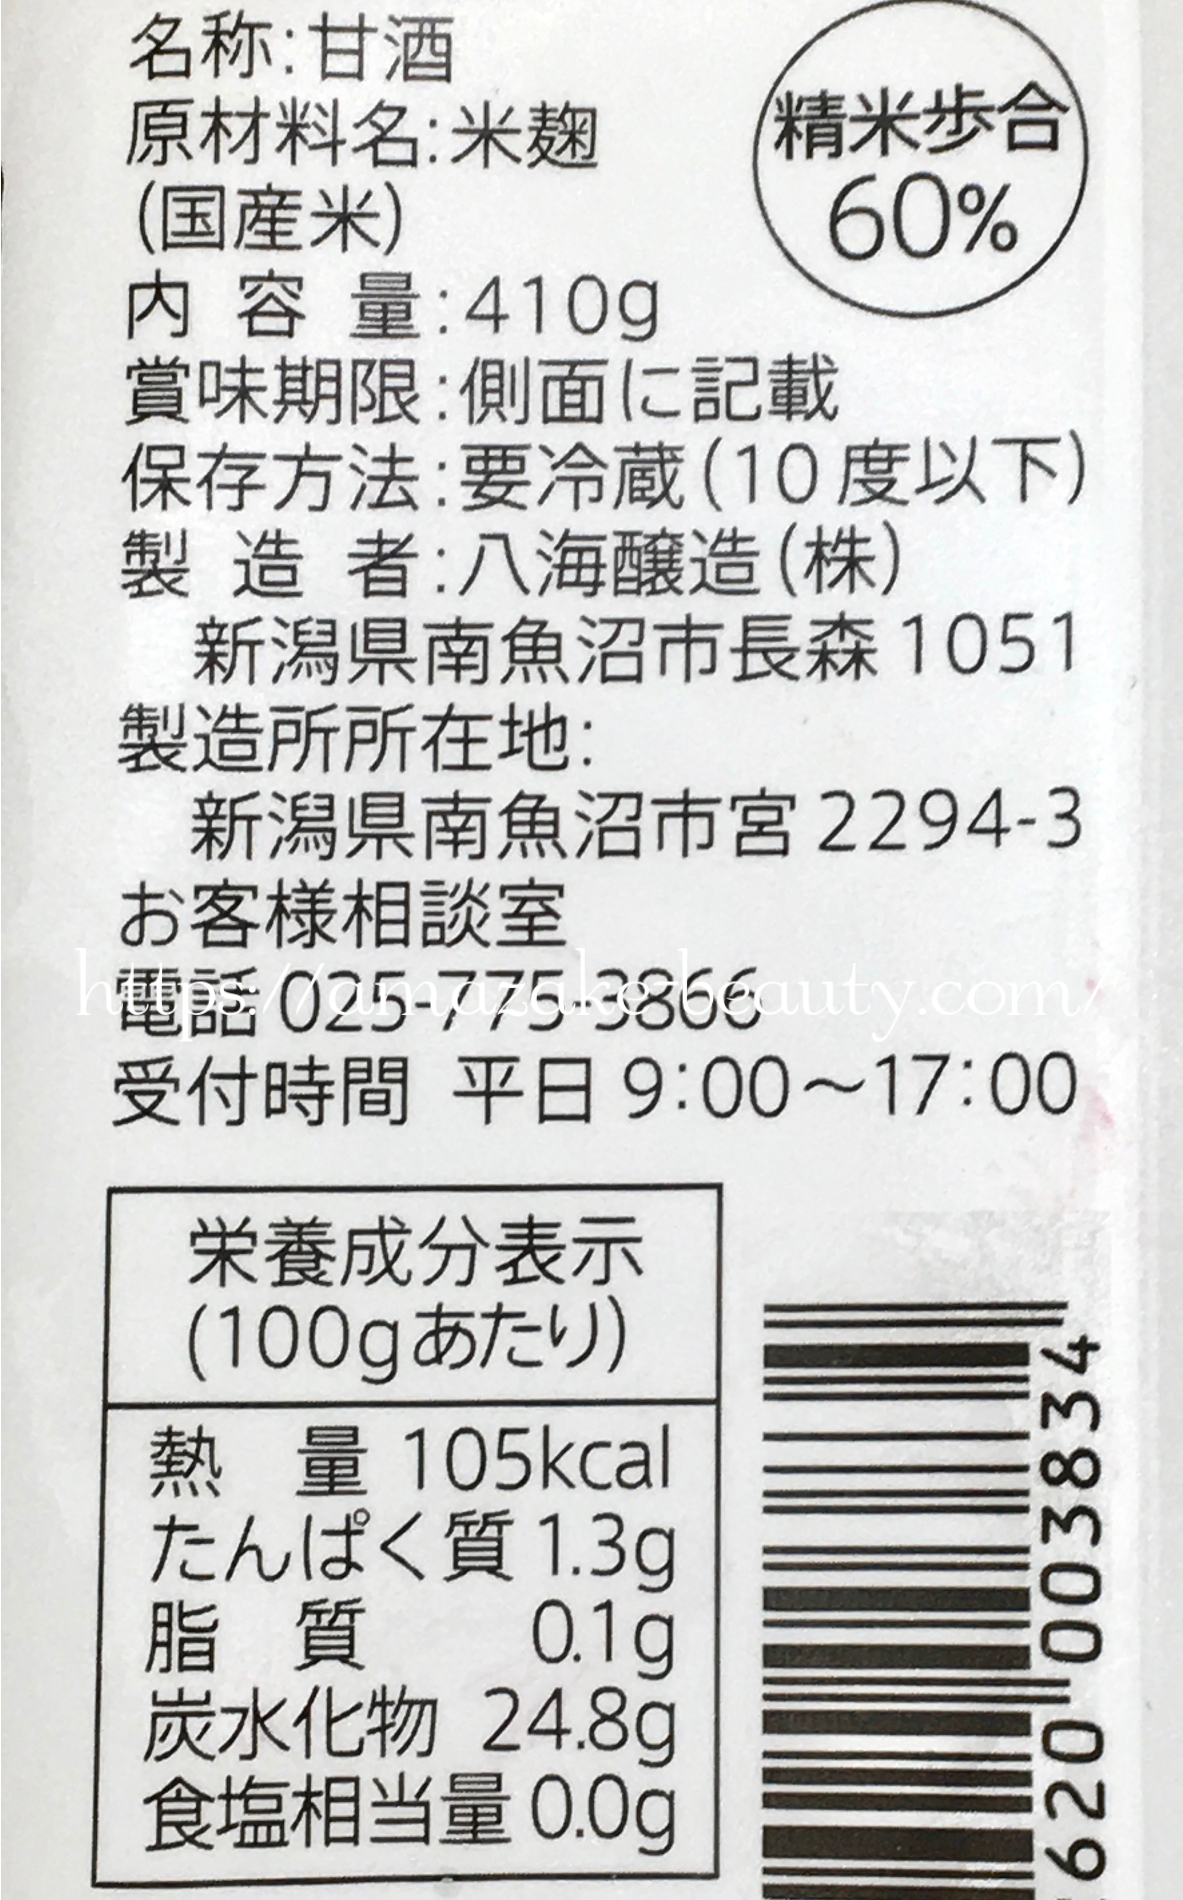 [amazake]hakkaisan[koji dakede tsukutta amasake](product description)